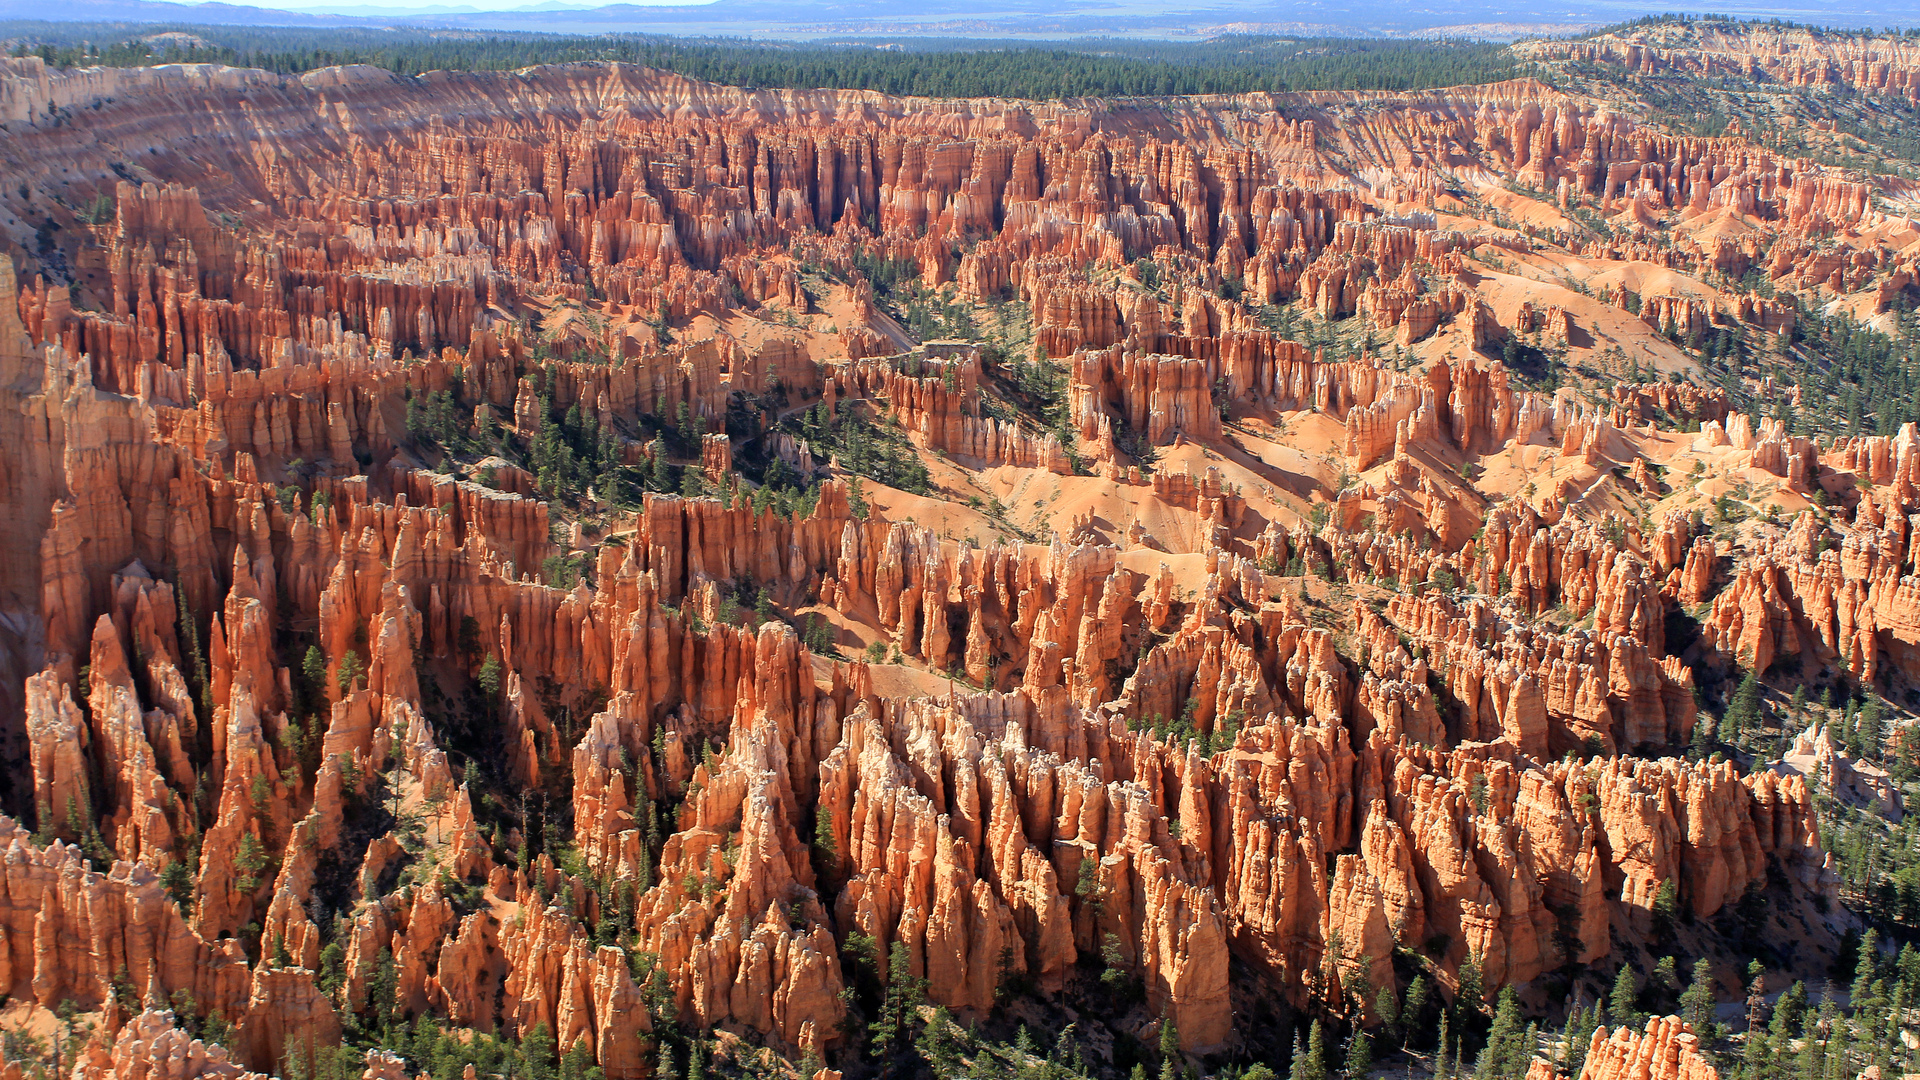 Paunsaugunt Plateau, Bryce Canyon National Park.